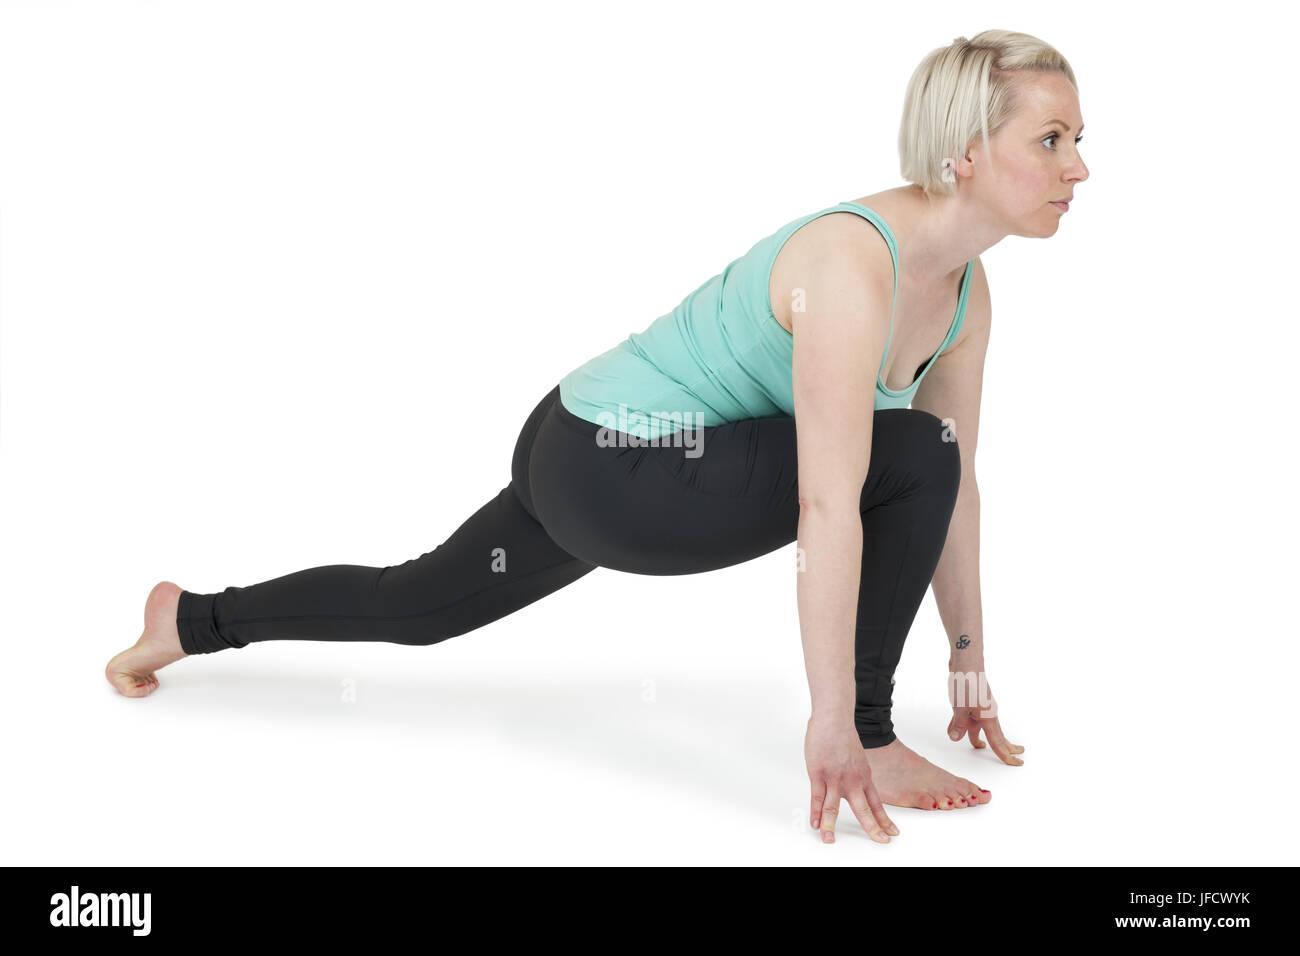 Yoga woman green position_193 Stock Photo